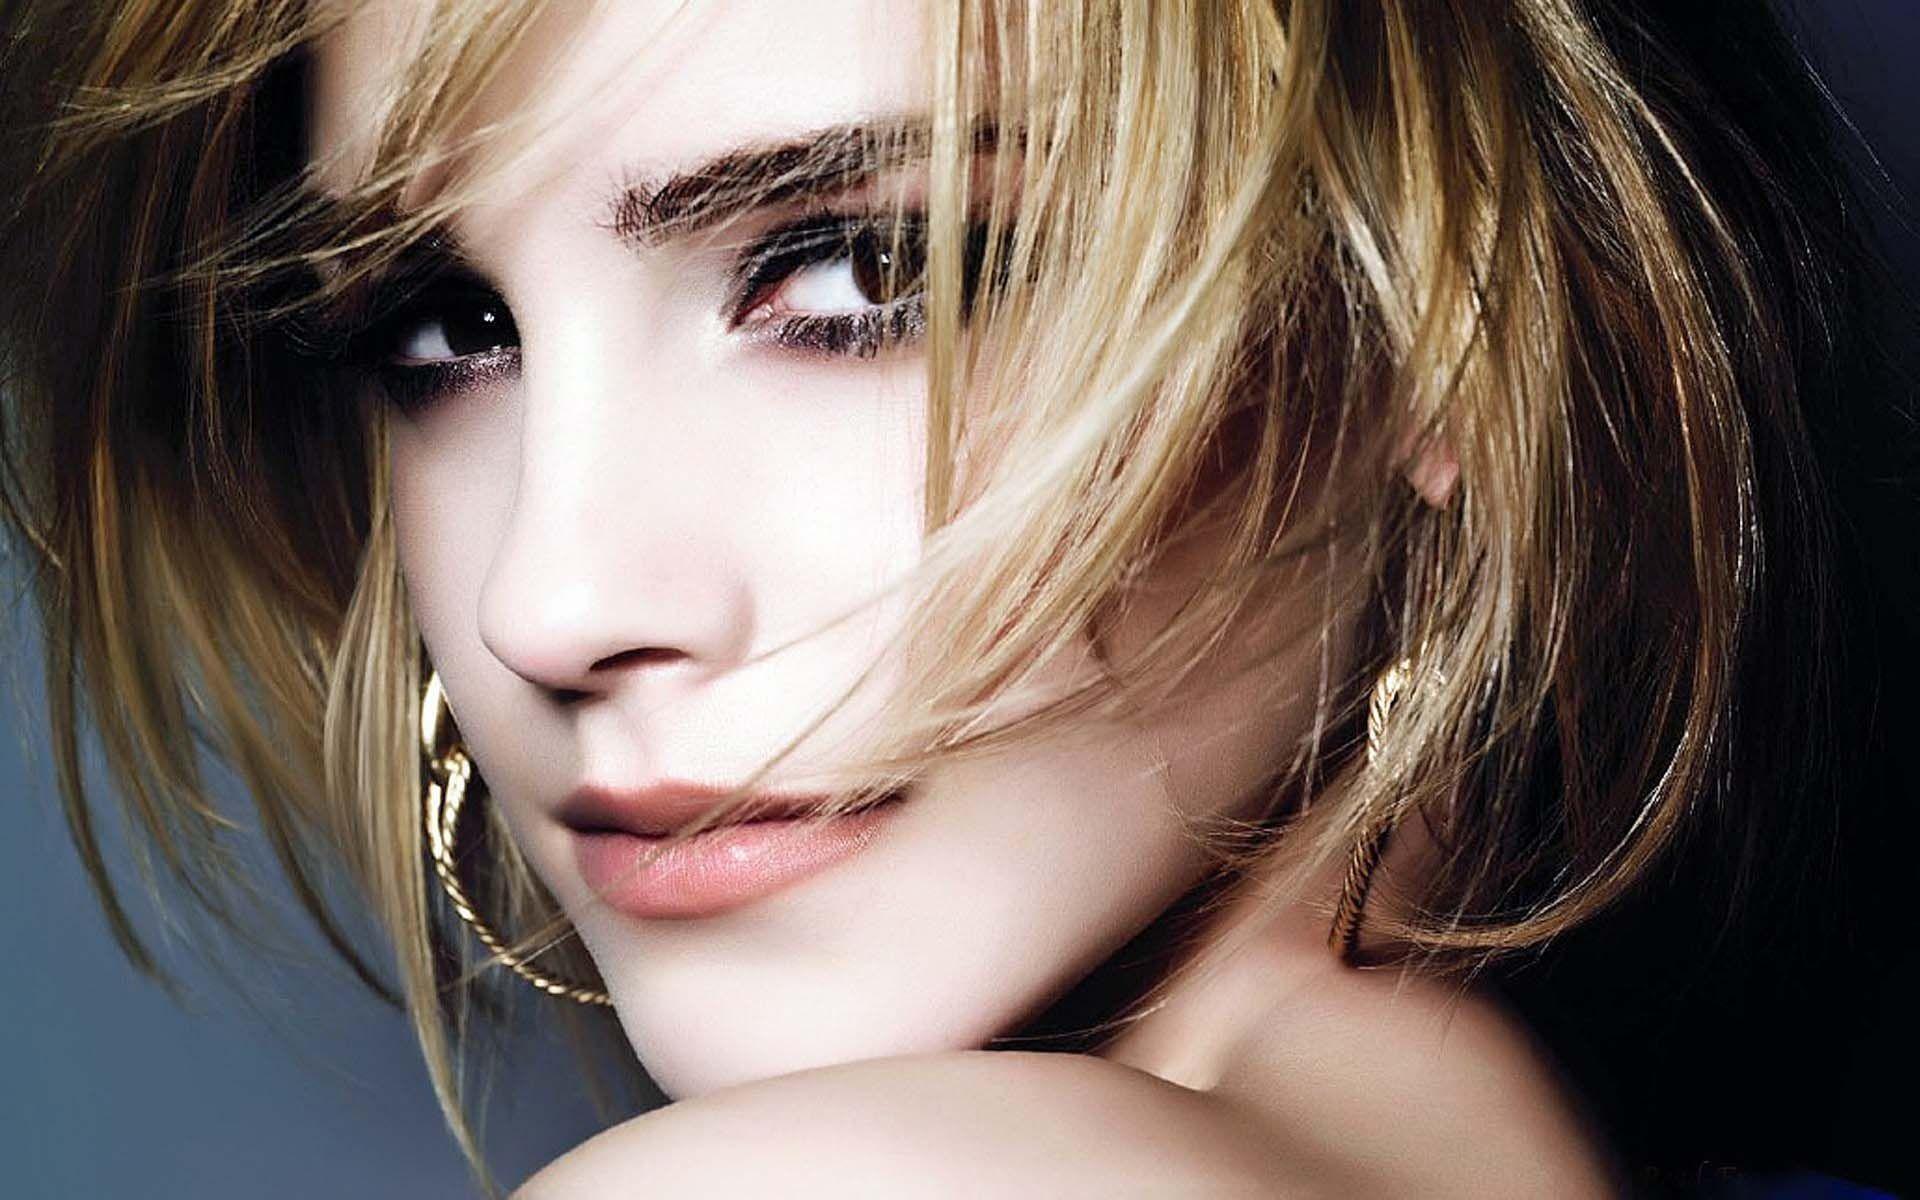 Beautiful Emma Latest Wallpapers | HD Wallpapers | ID #6396